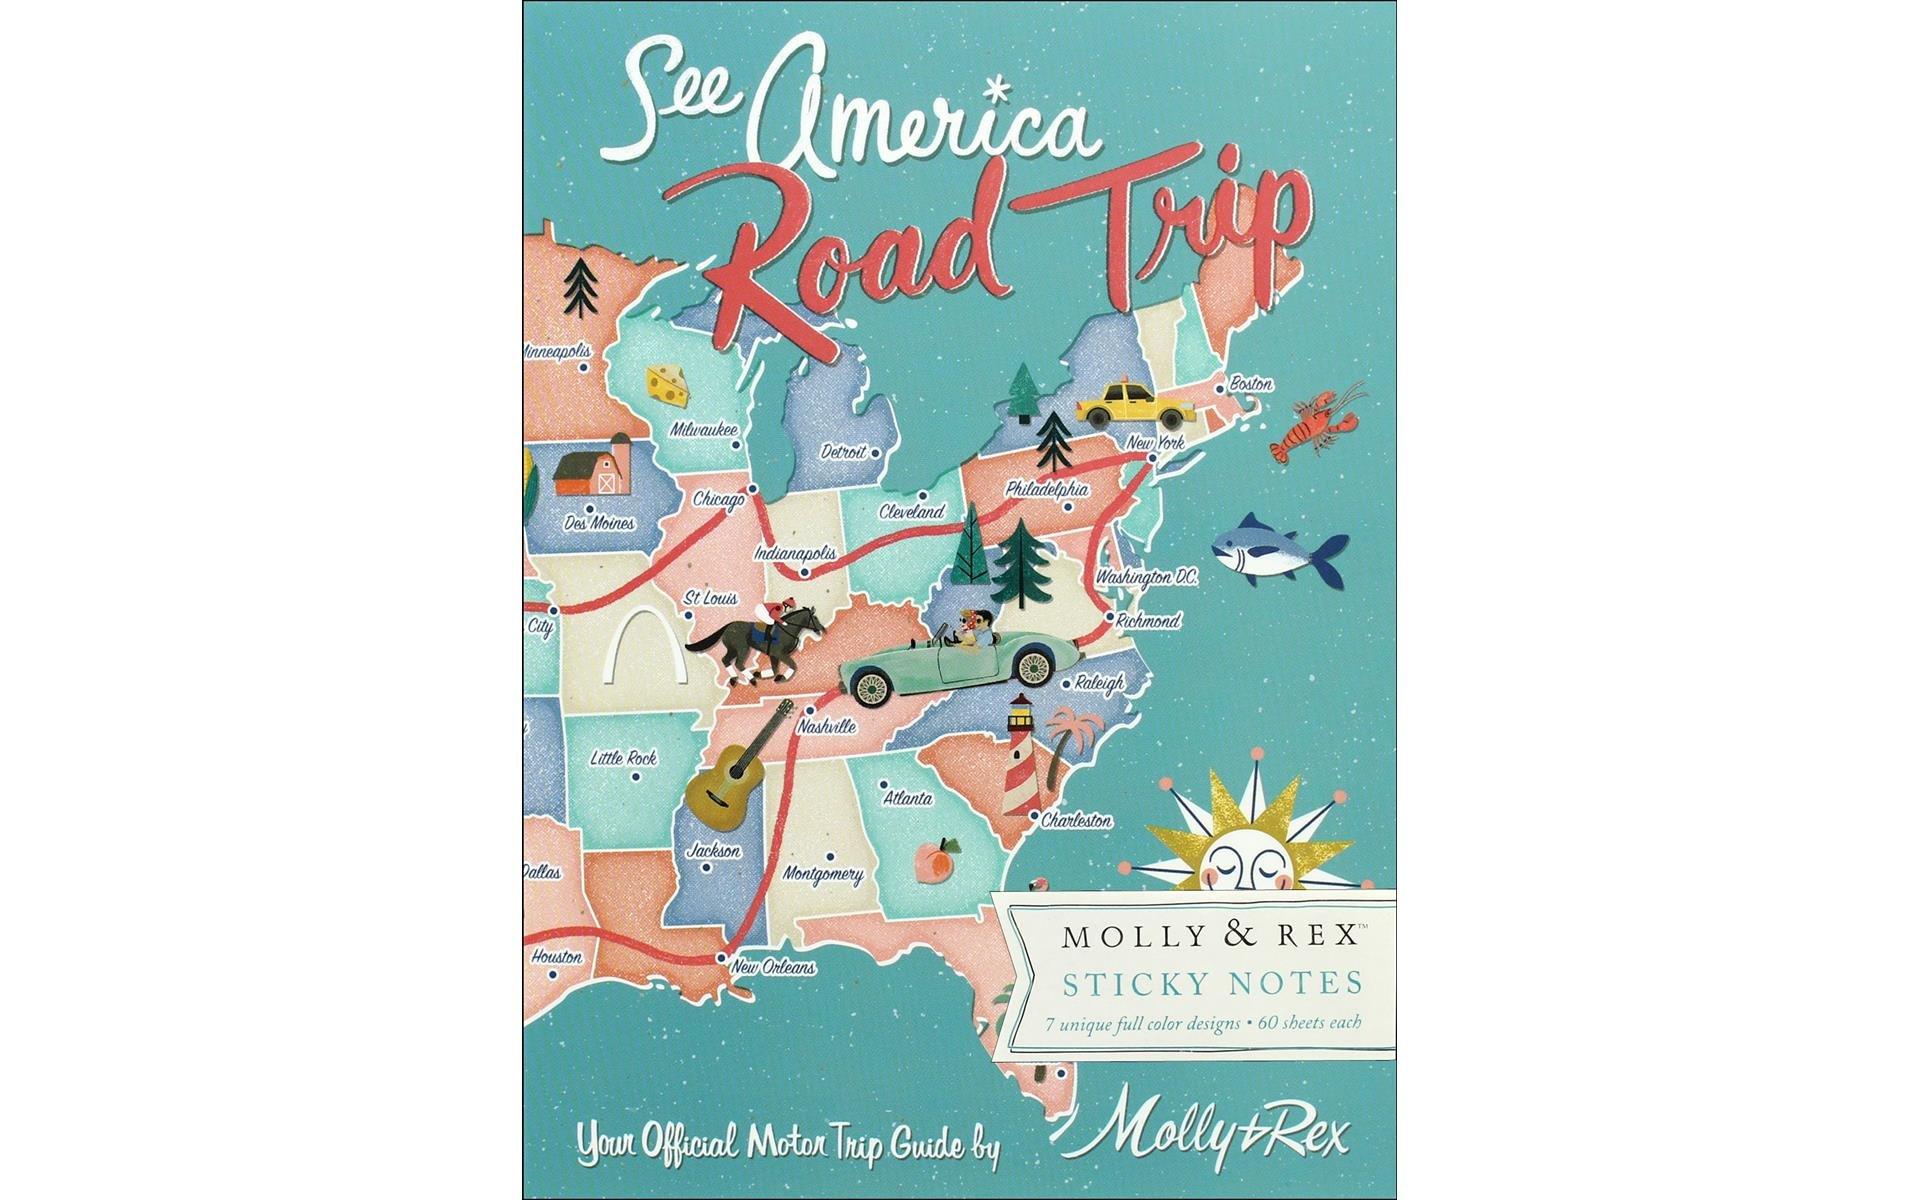 Molly & Rex Note Sticky Pad Portfolio Road Trip